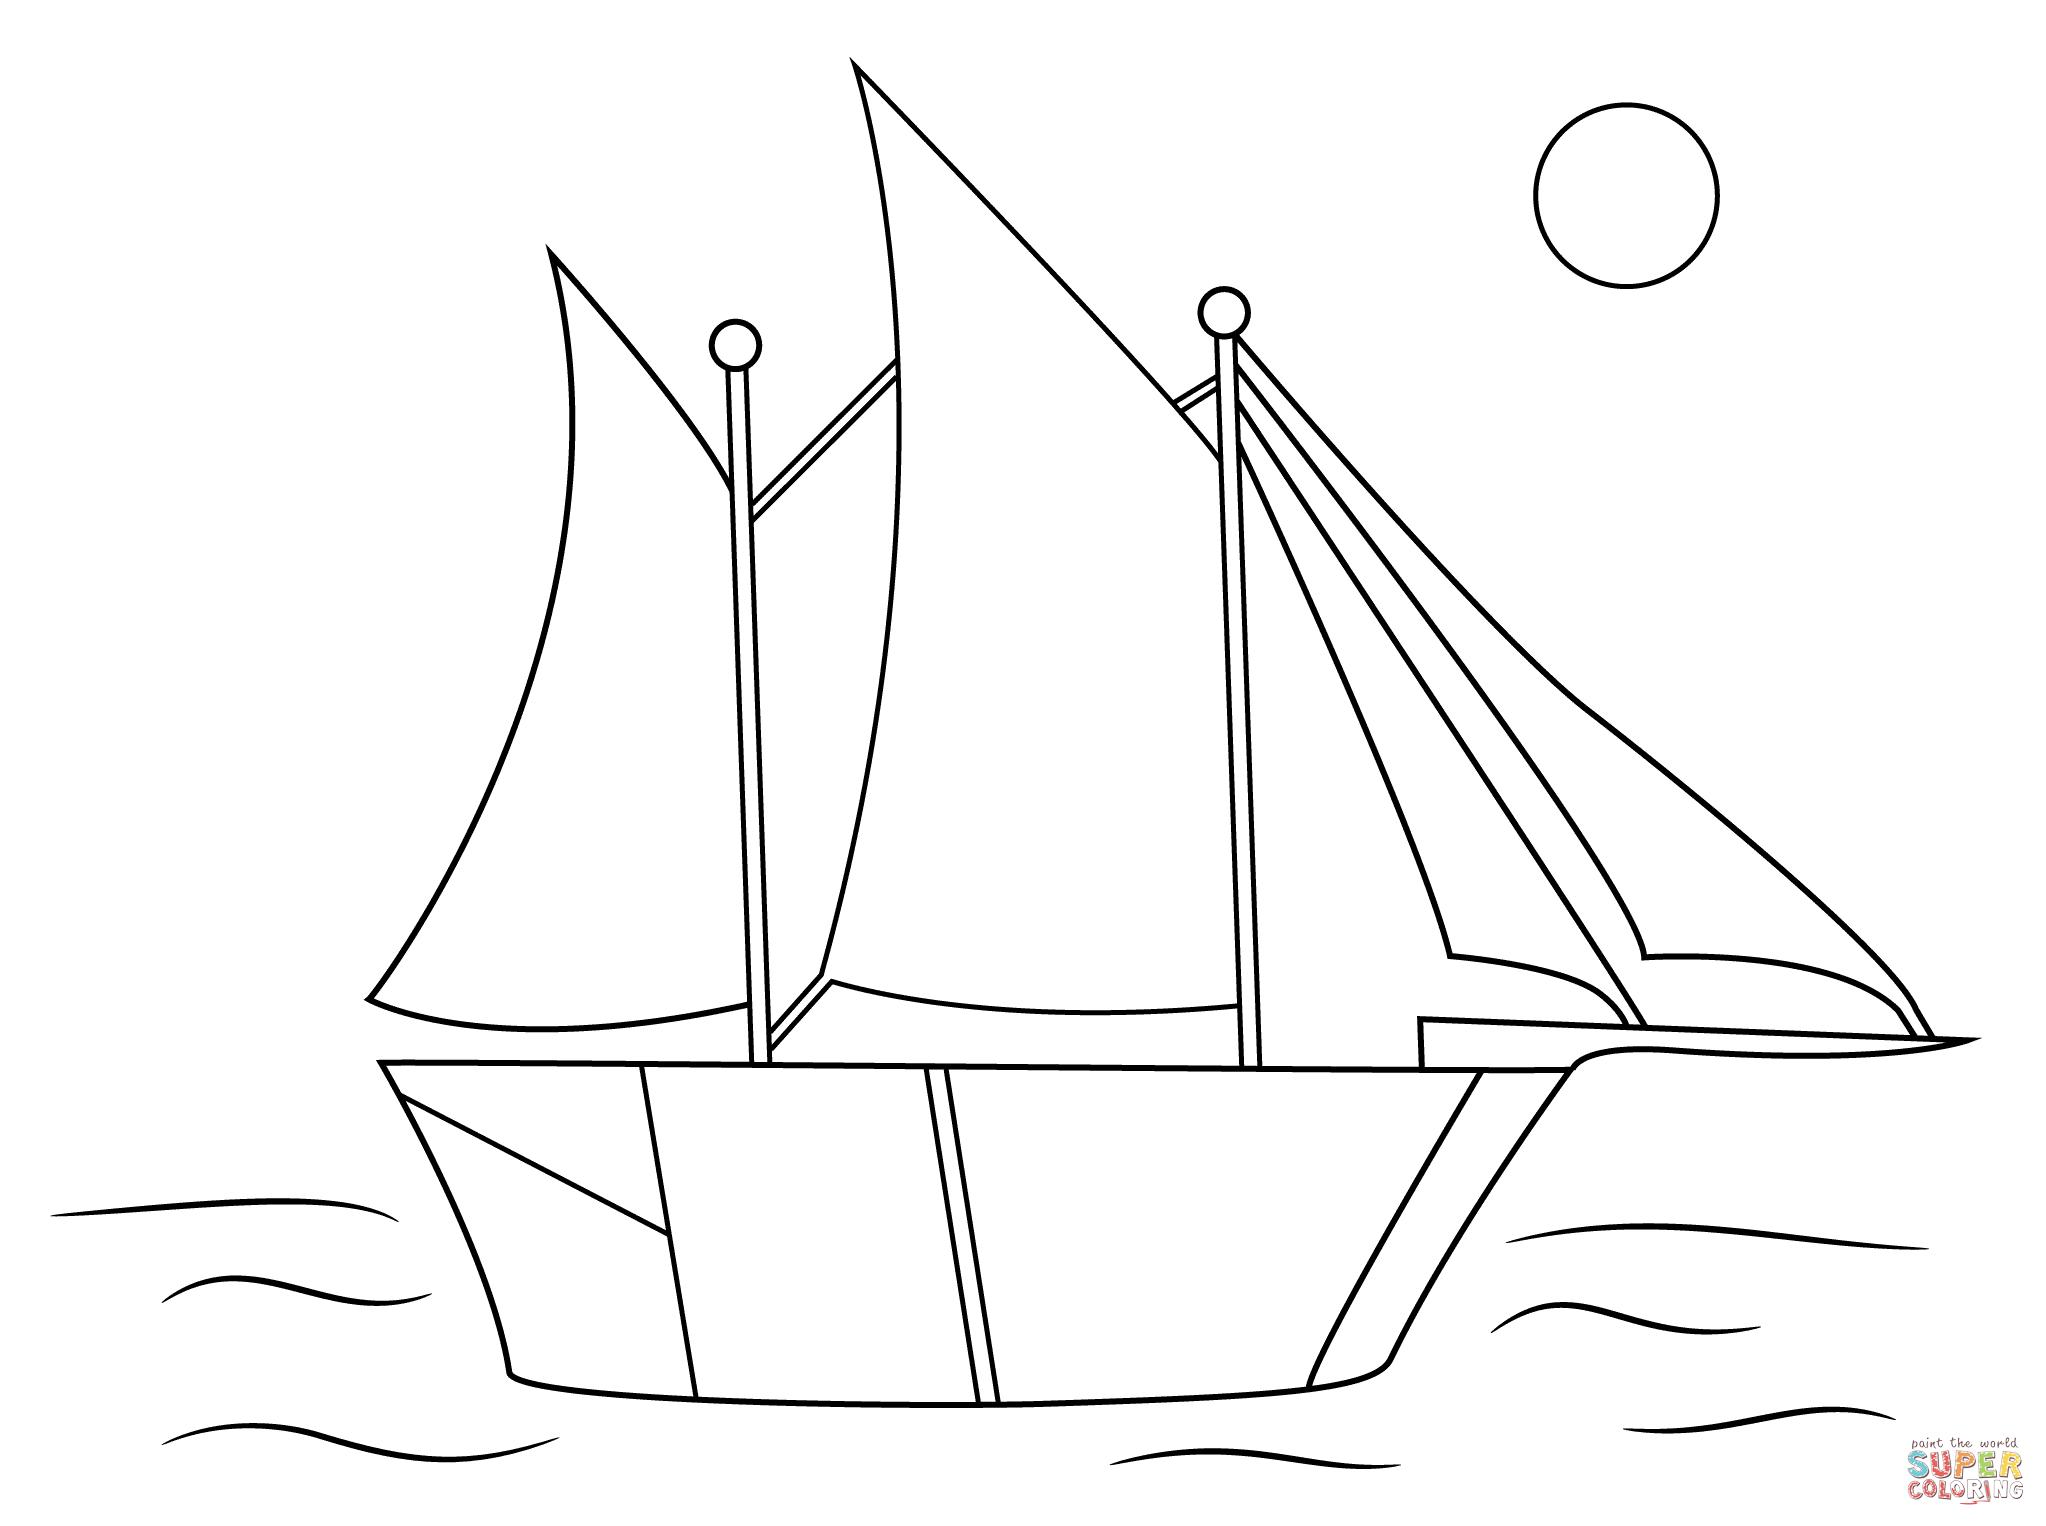 Aboriginal Drawing of Sailing Ship Coloring Books